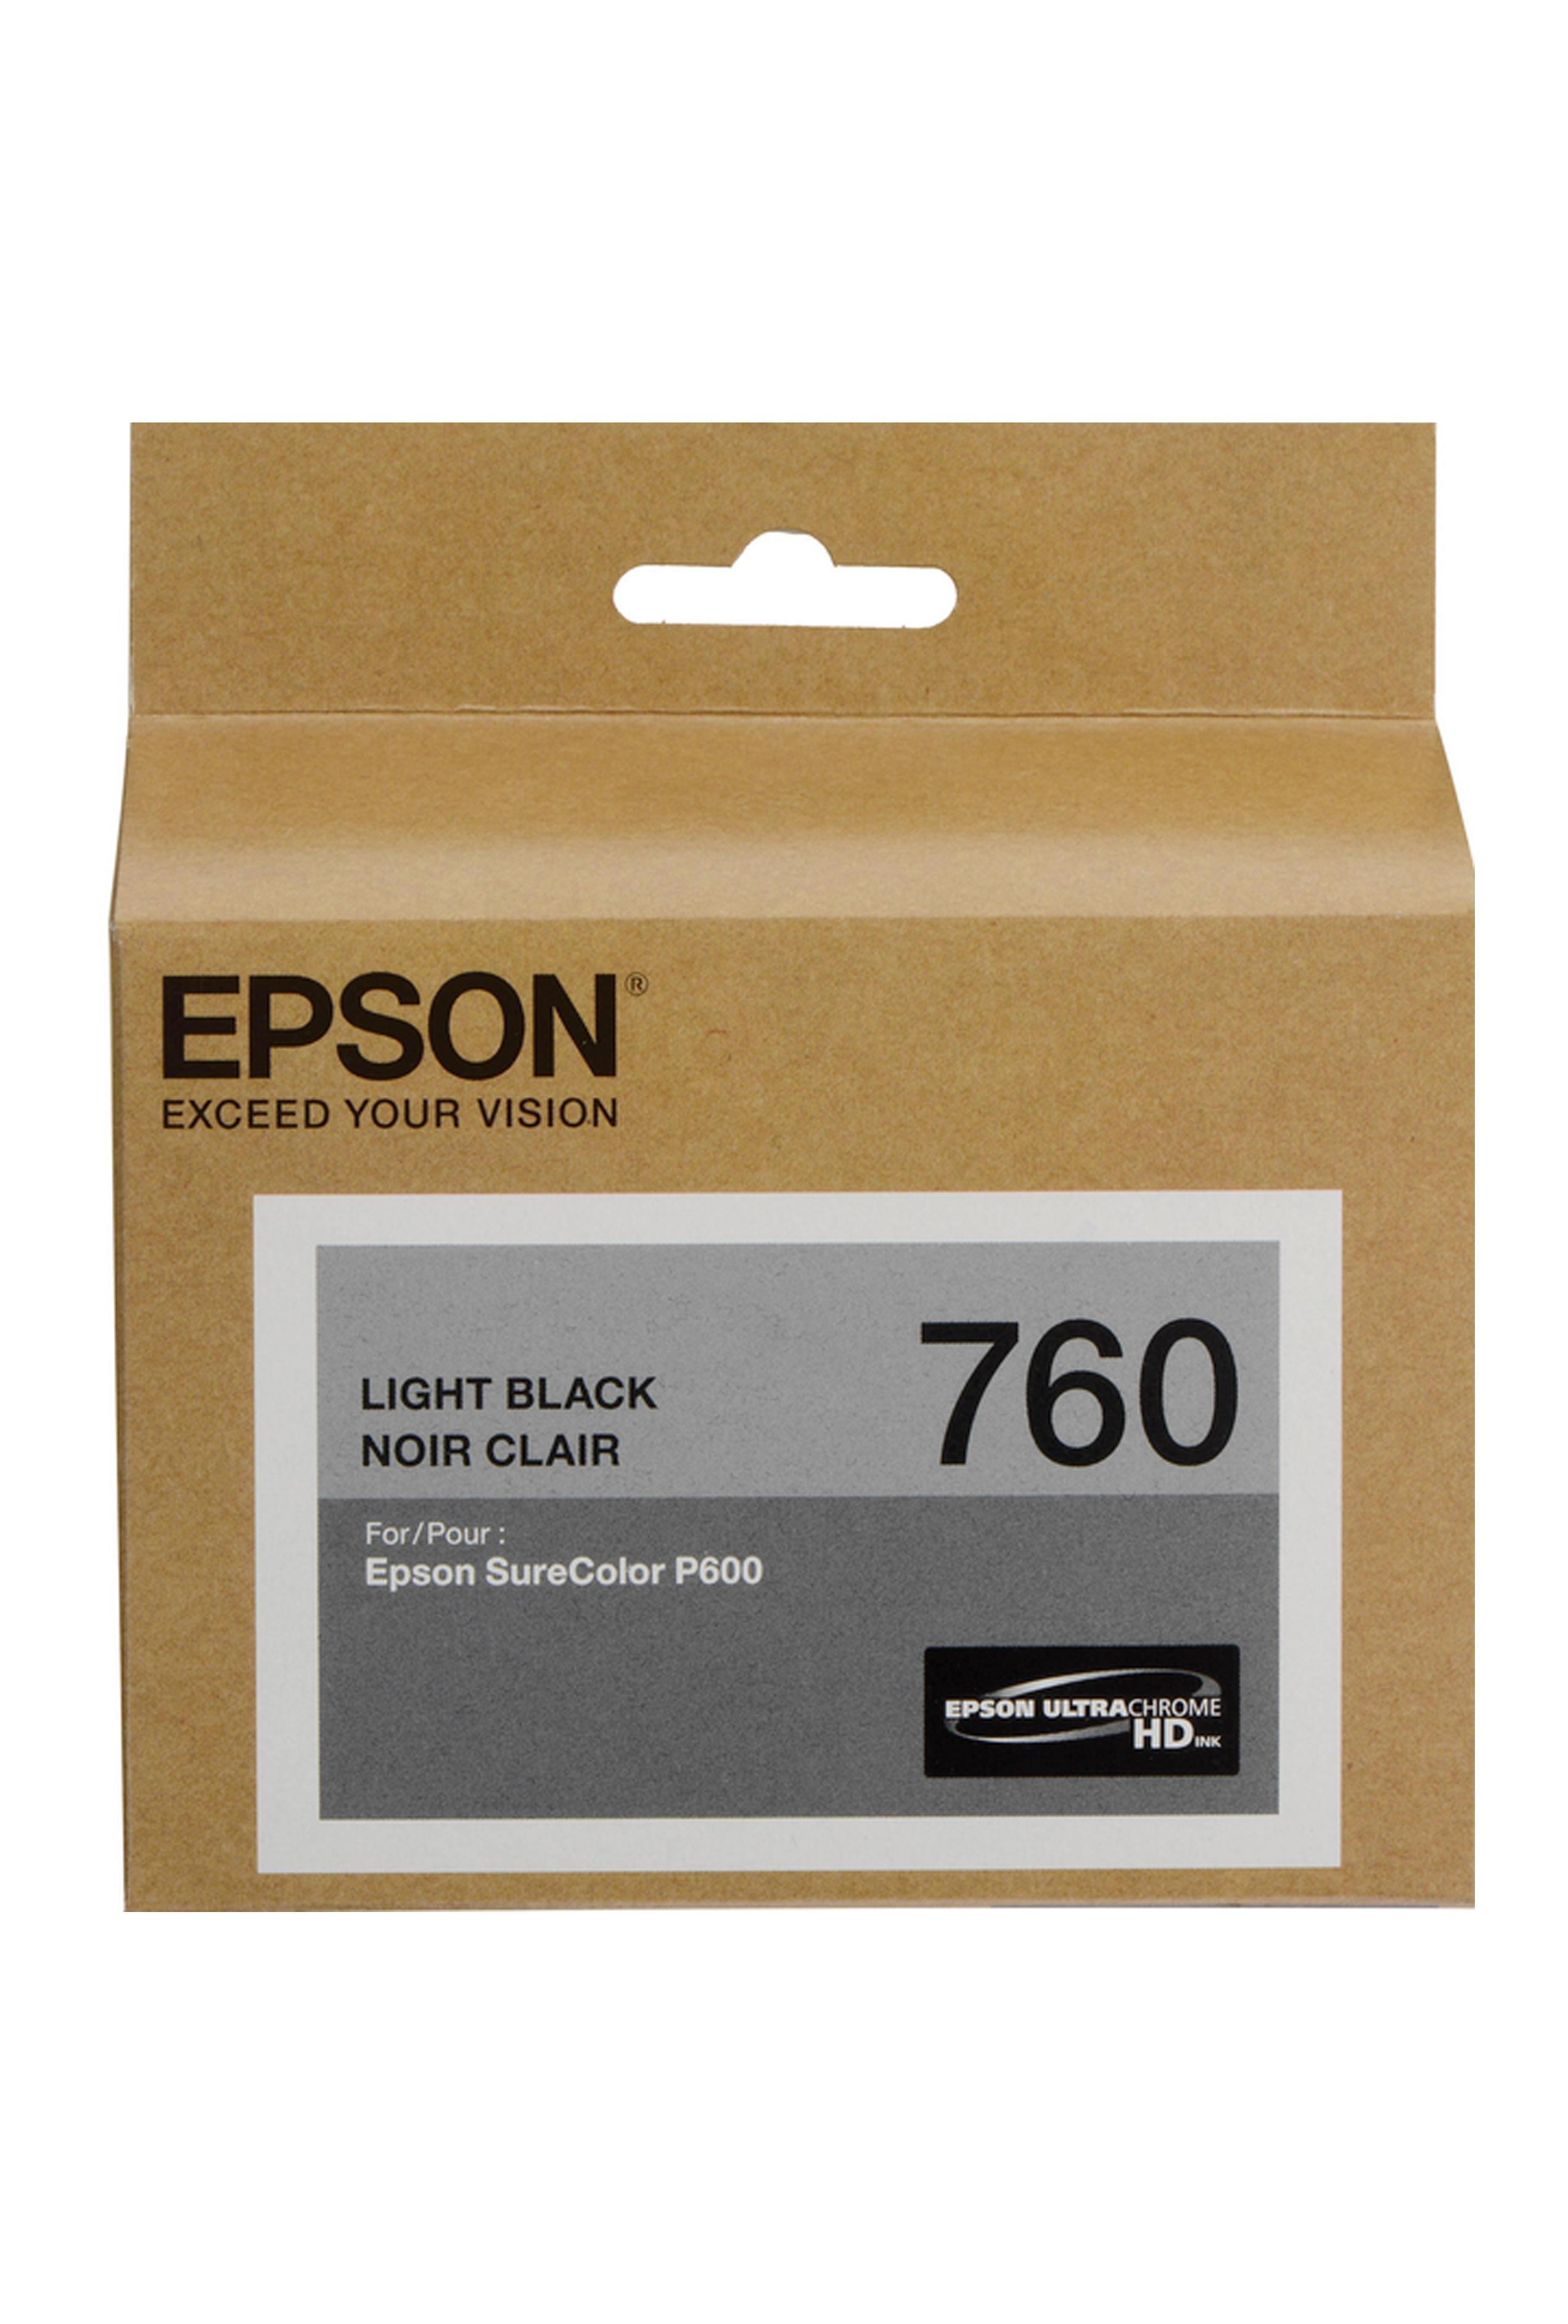 Epson 760, Light Black Ink Cartridge (T760720)